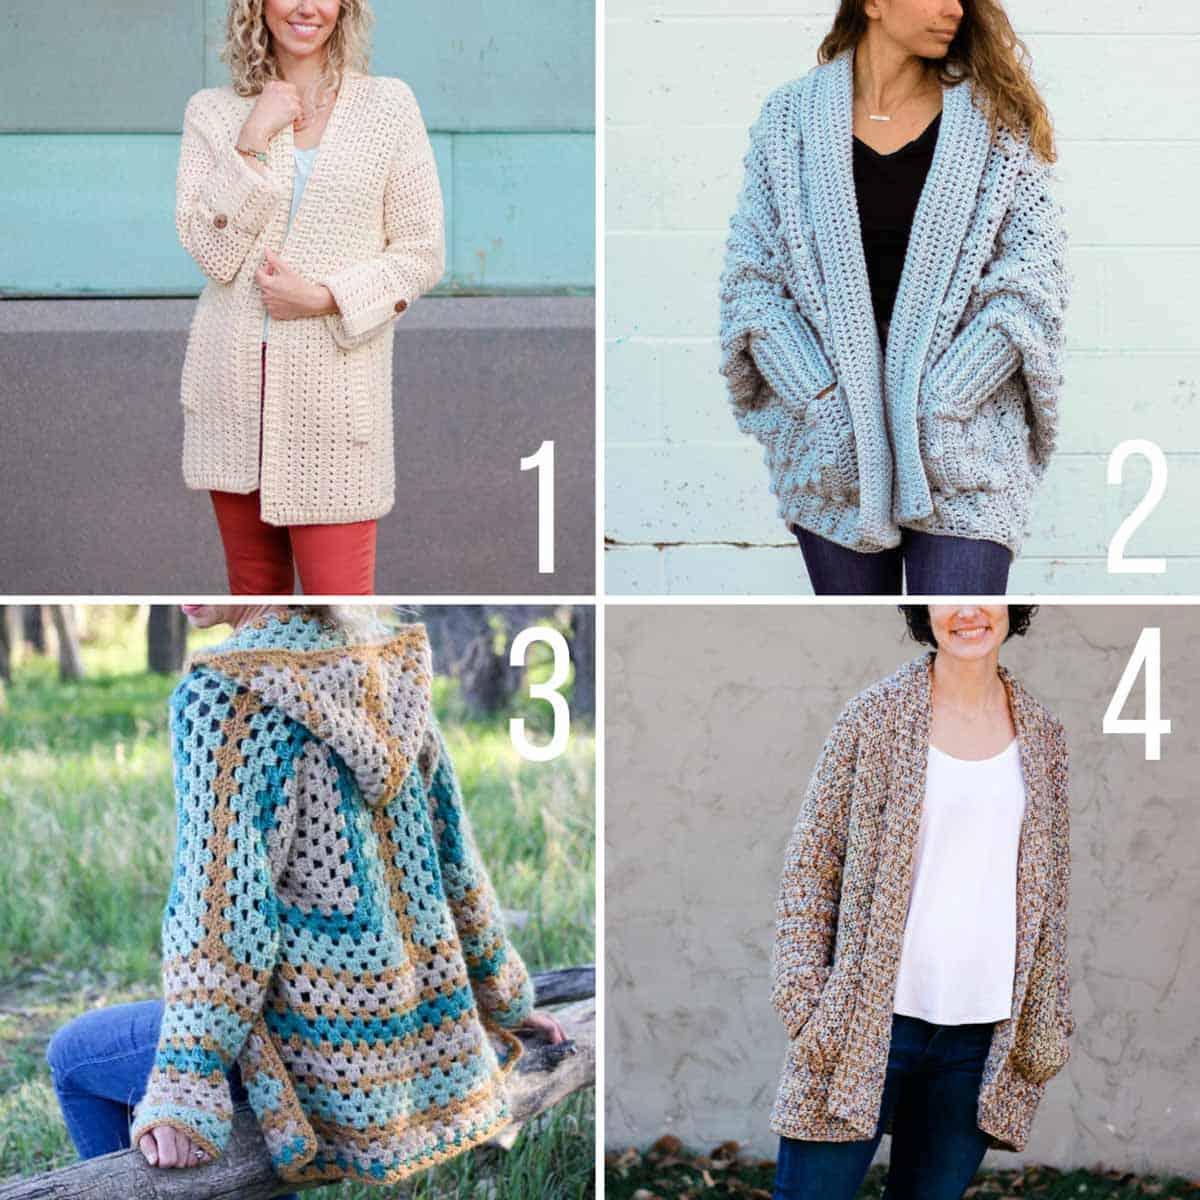 Free crochet cardigan patterns made using Lion Brand yarns.